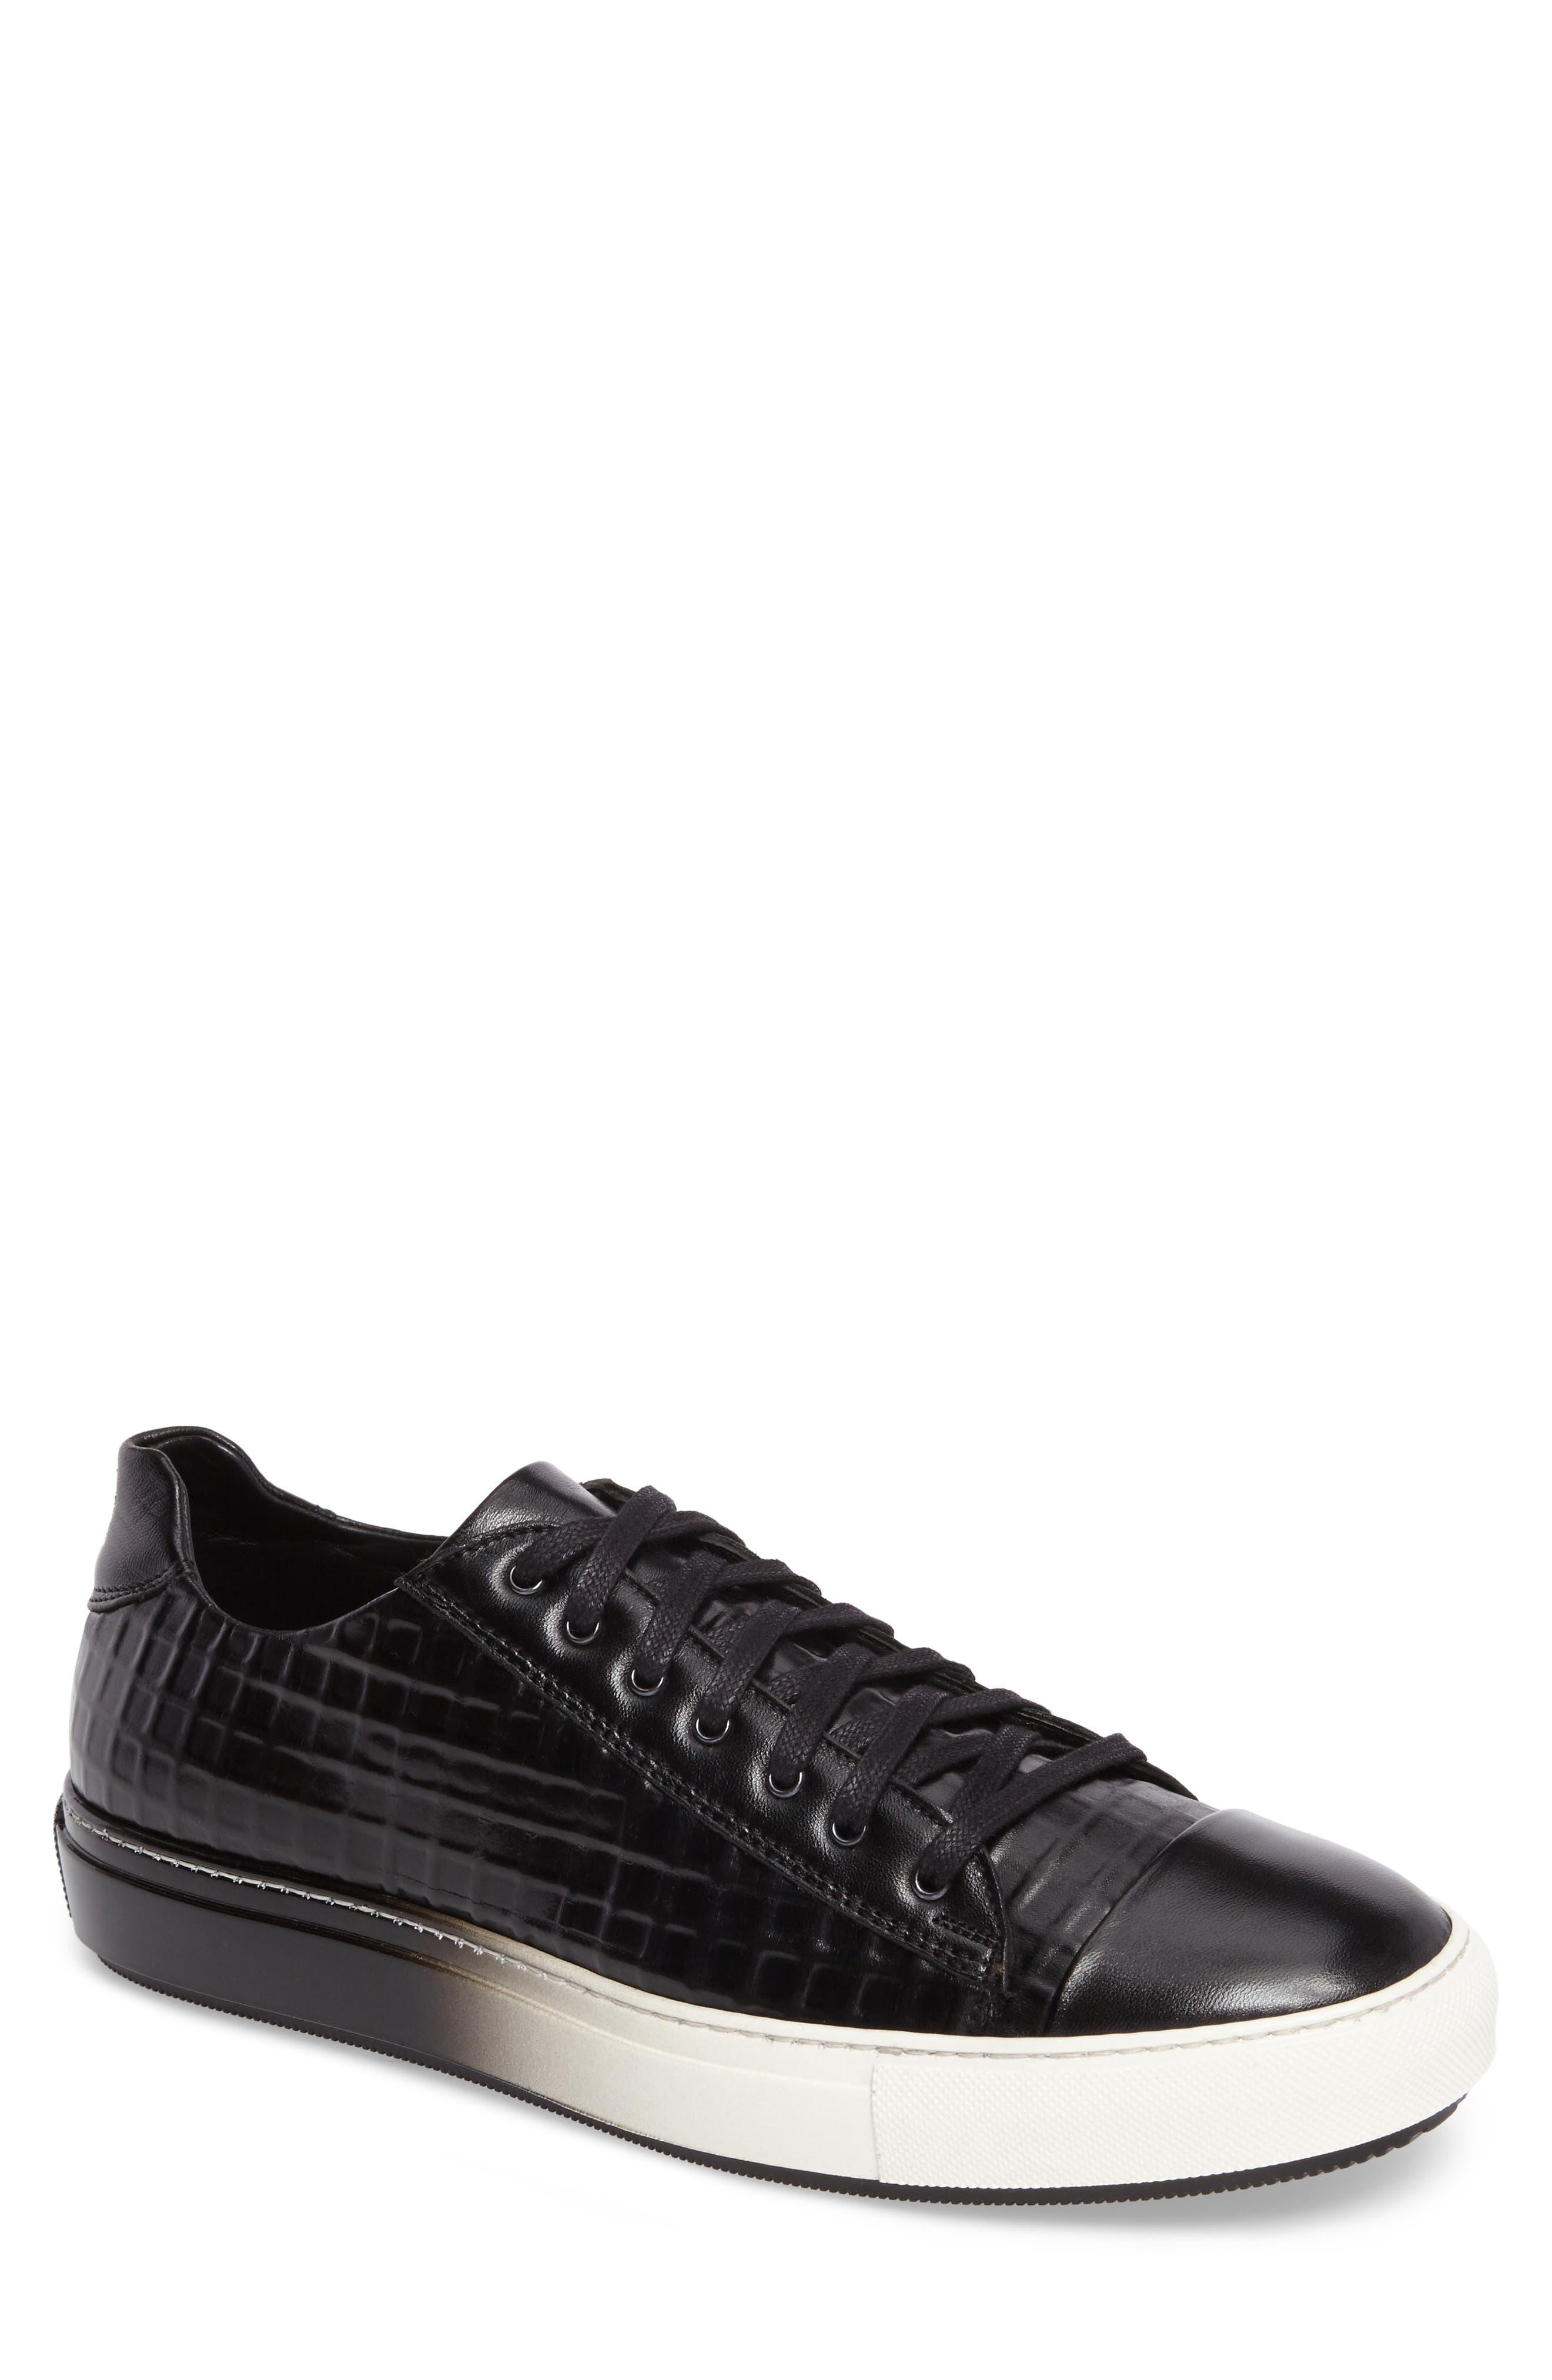 Vera II Sneaker,                         Main,                         color, Black Leather